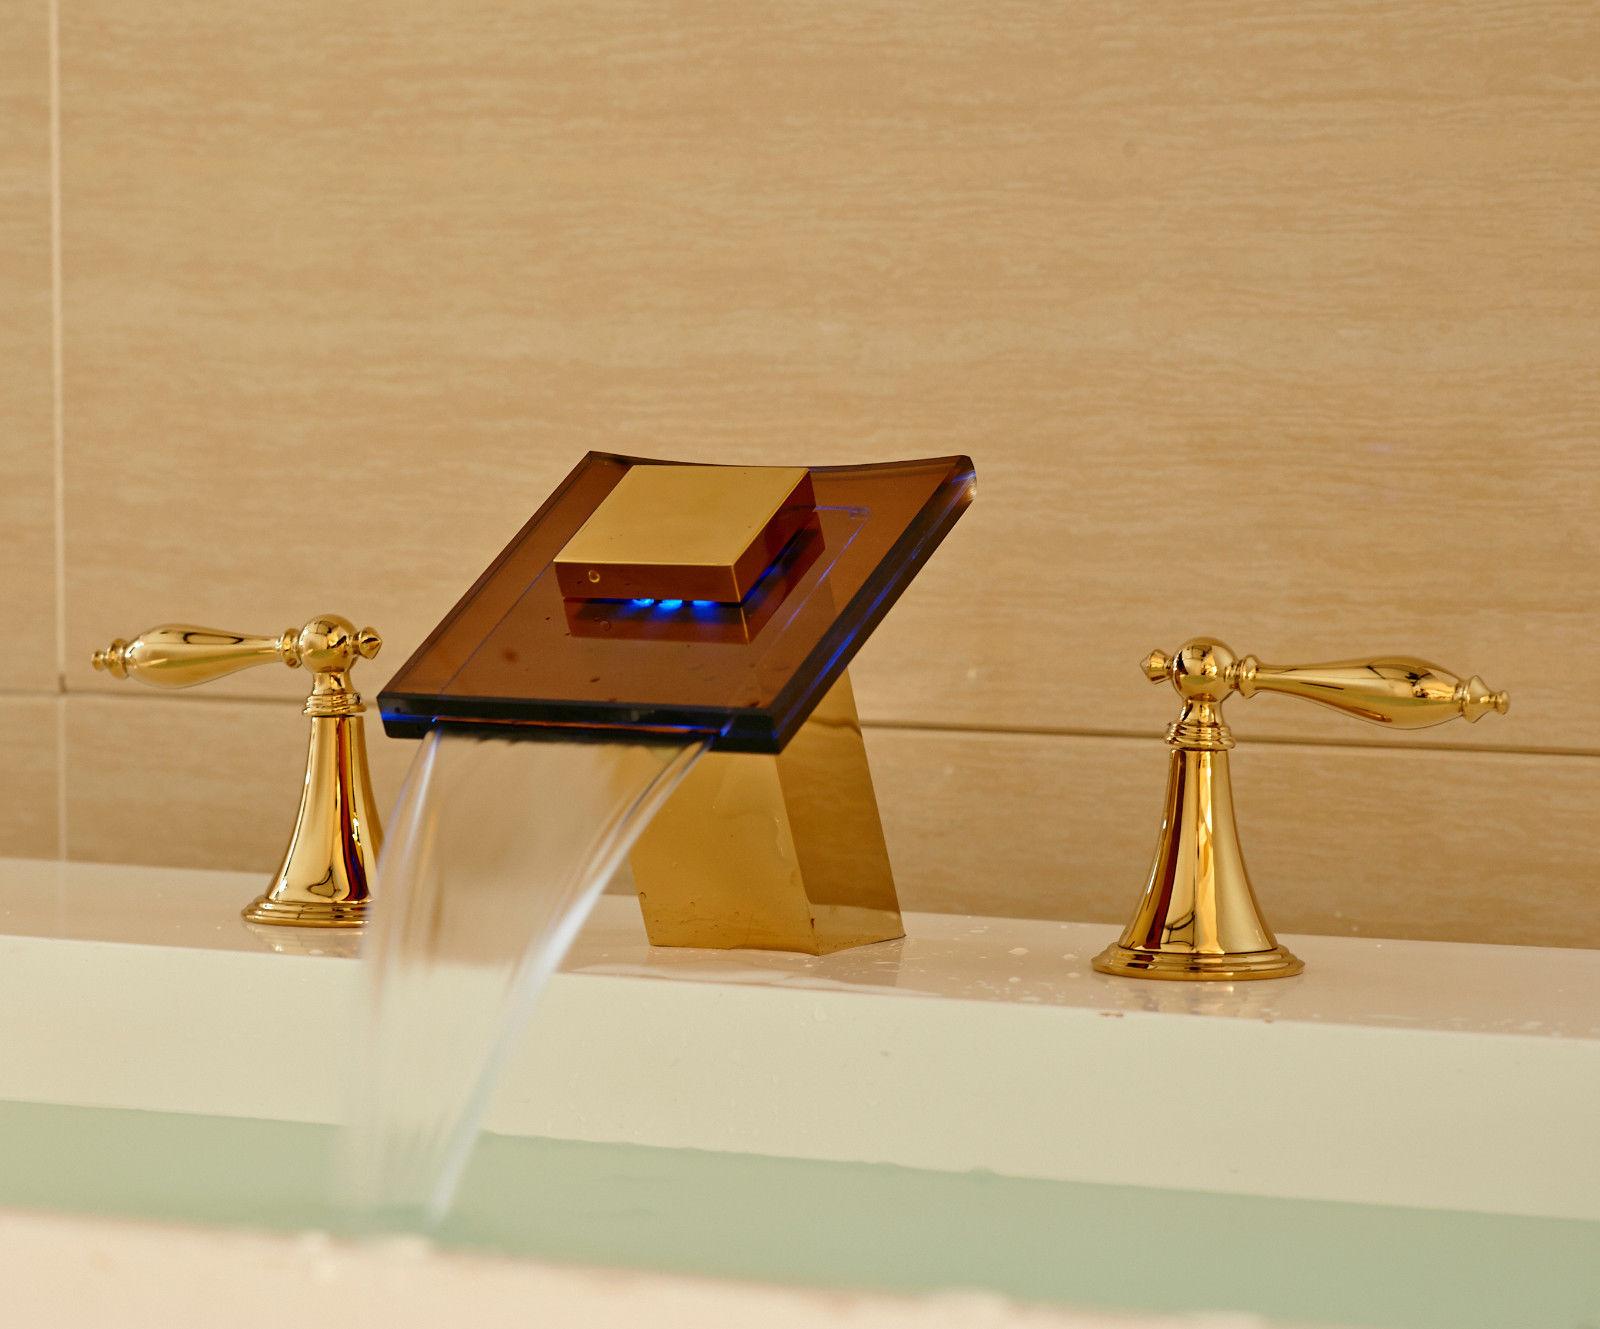 Glass Spout Bathroom Sink Faucet Gold Finish